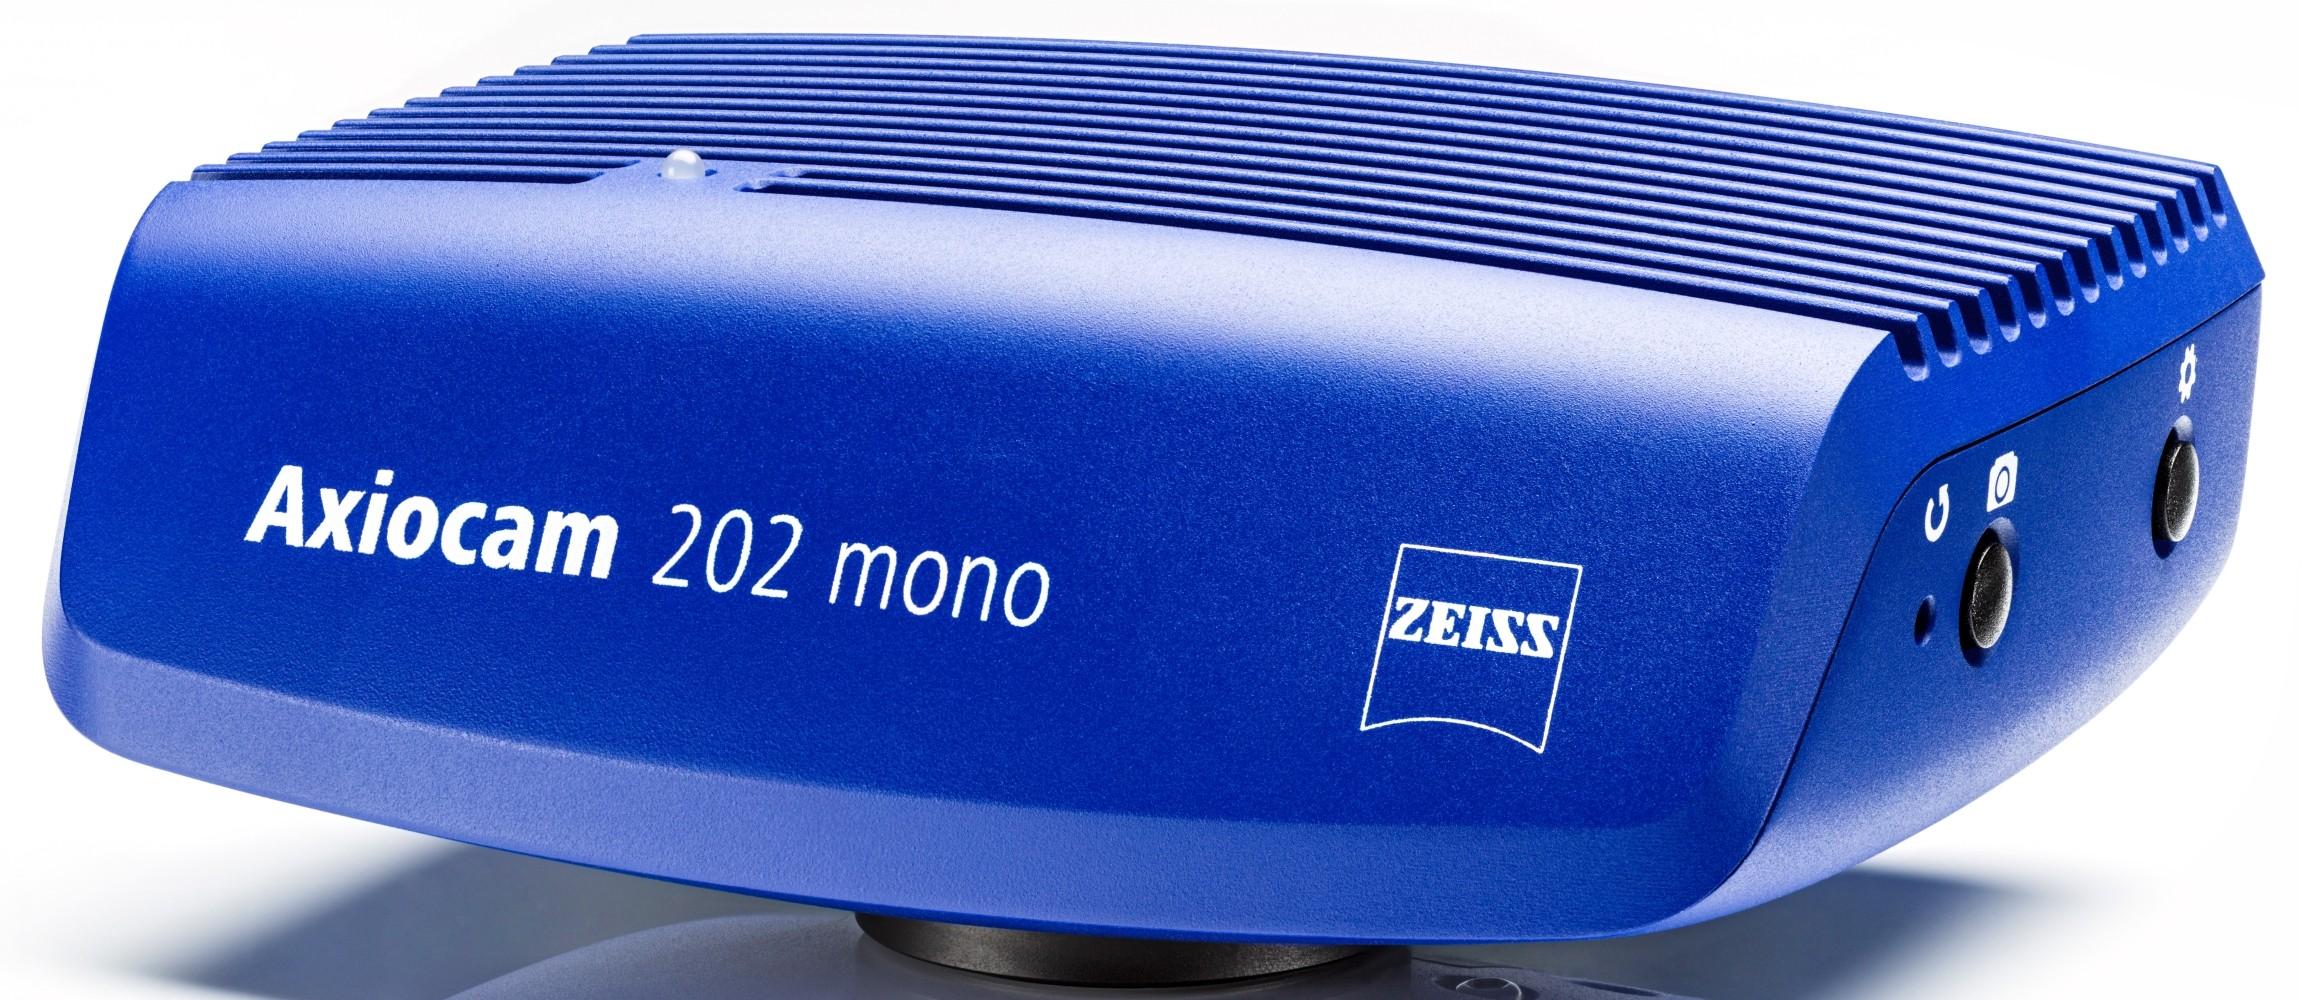 Zeiss Axiocam 202 mono seitlich